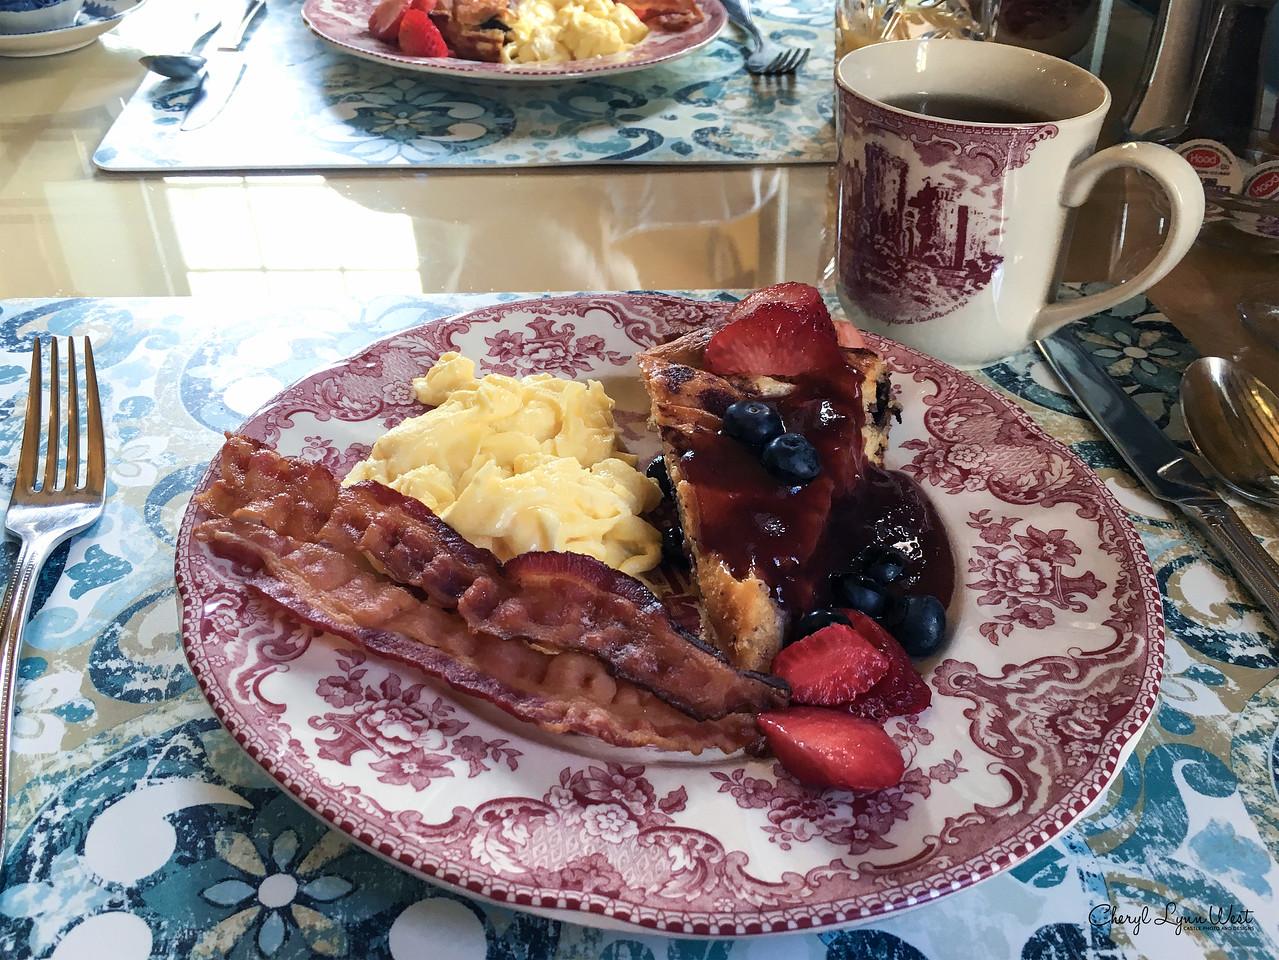 Casa de Solana Bed & Breakfast